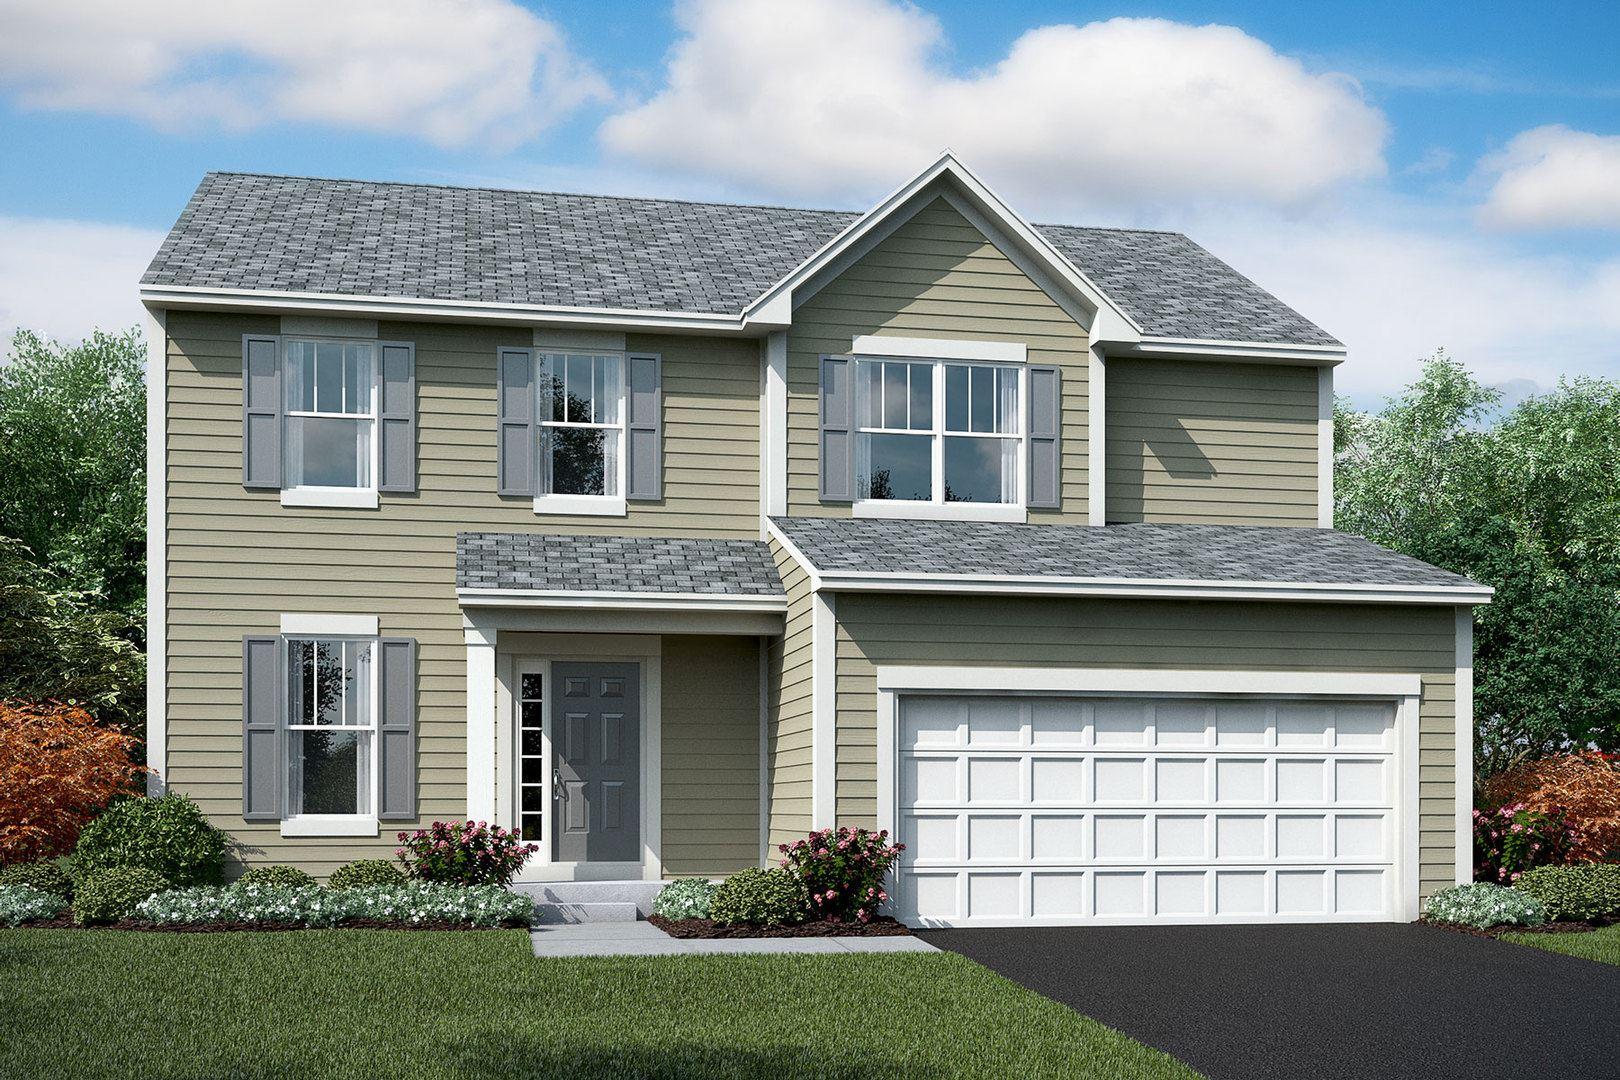 26143 S White Oak  Lot#550 Trail, Channahon, IL 60410 - #: 10737272